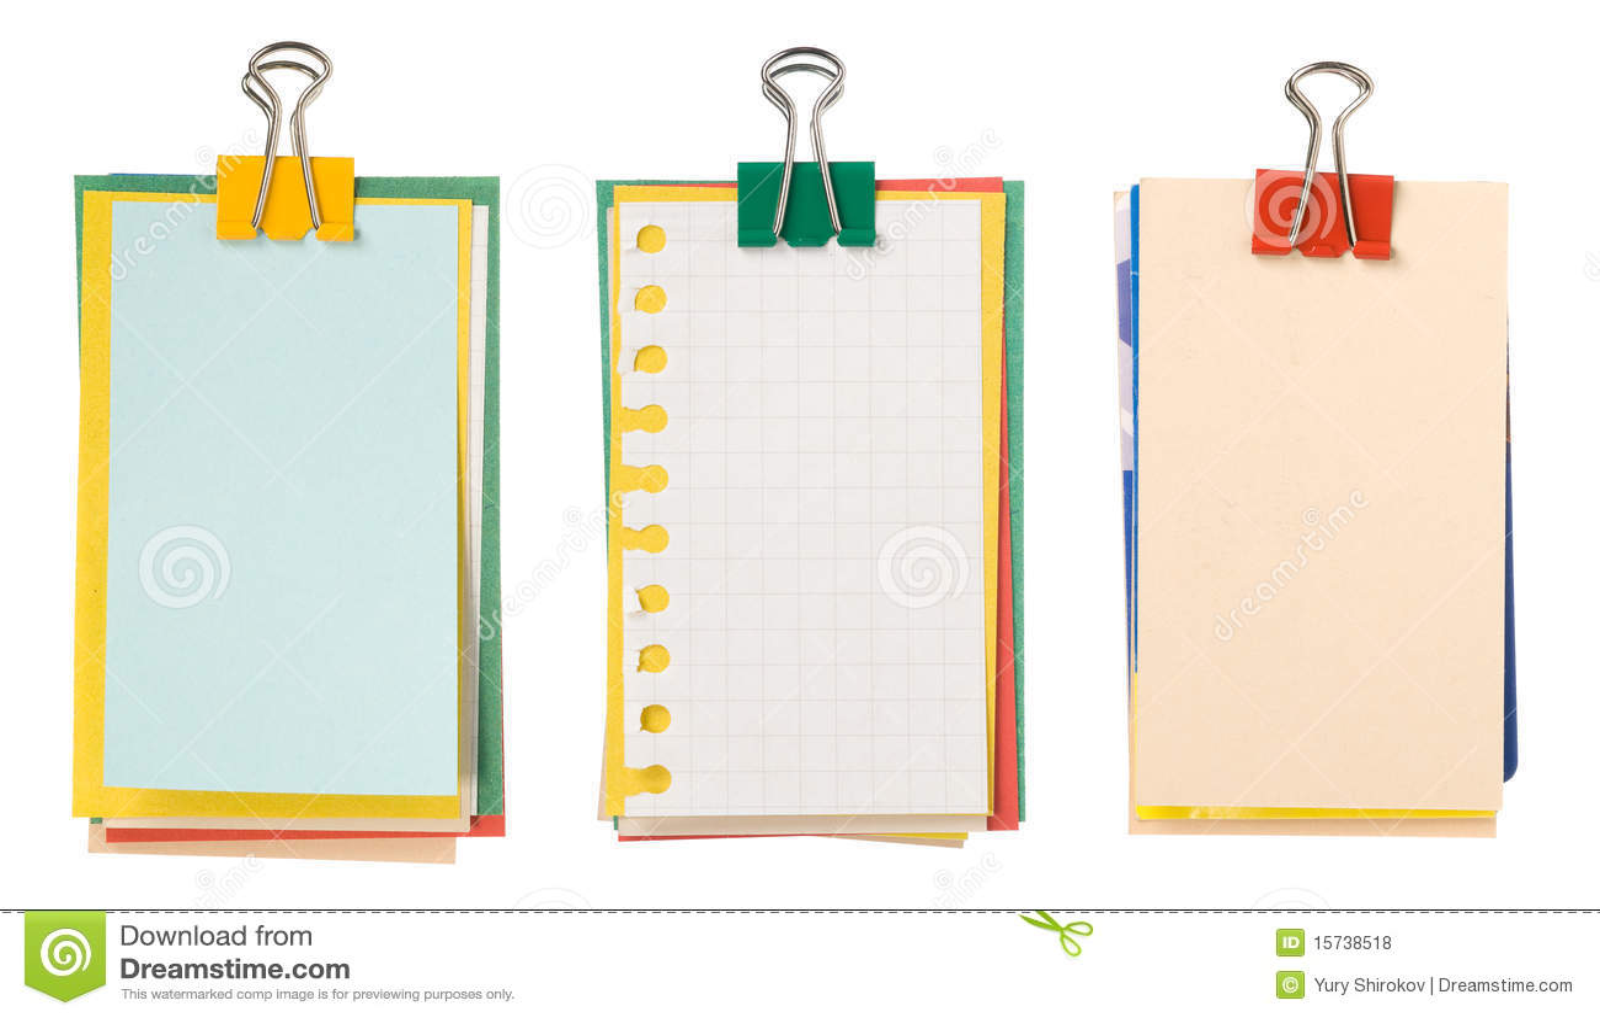 Bundle of paper